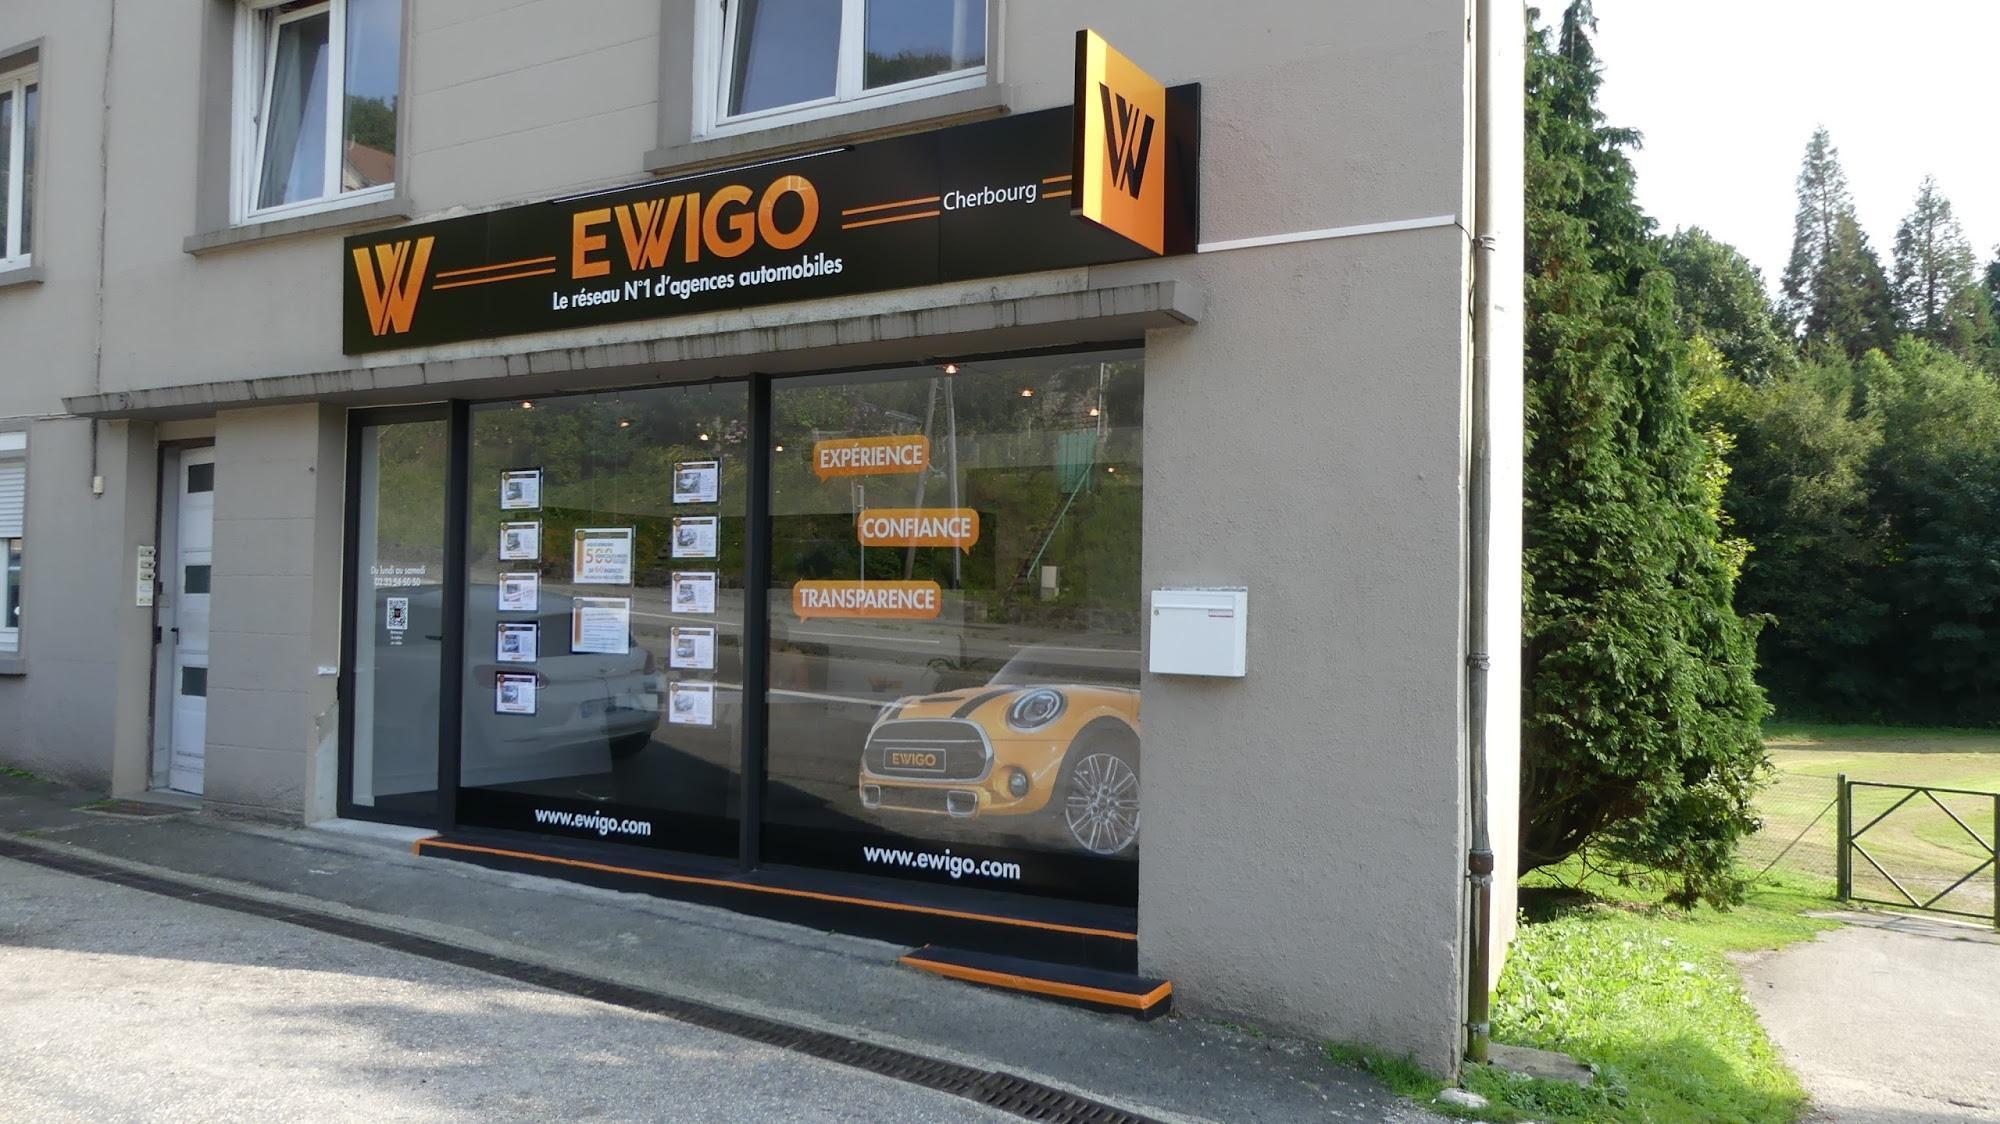 Ewigo Cherbourg CHERBOURG-EN-COTENTIN 5